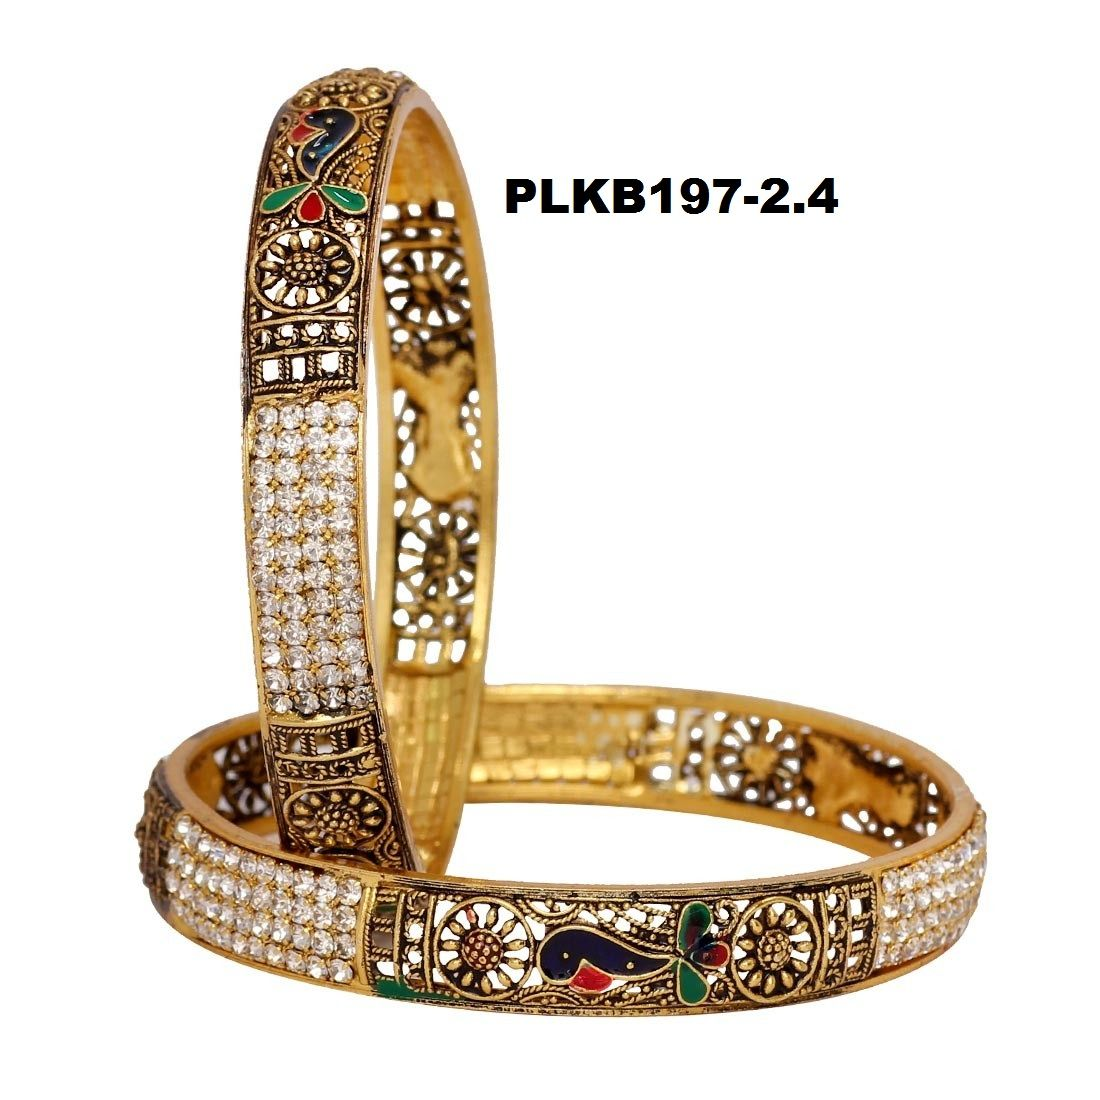 Pin by eindiawholesale on bangles u bracelets pinterest bangles